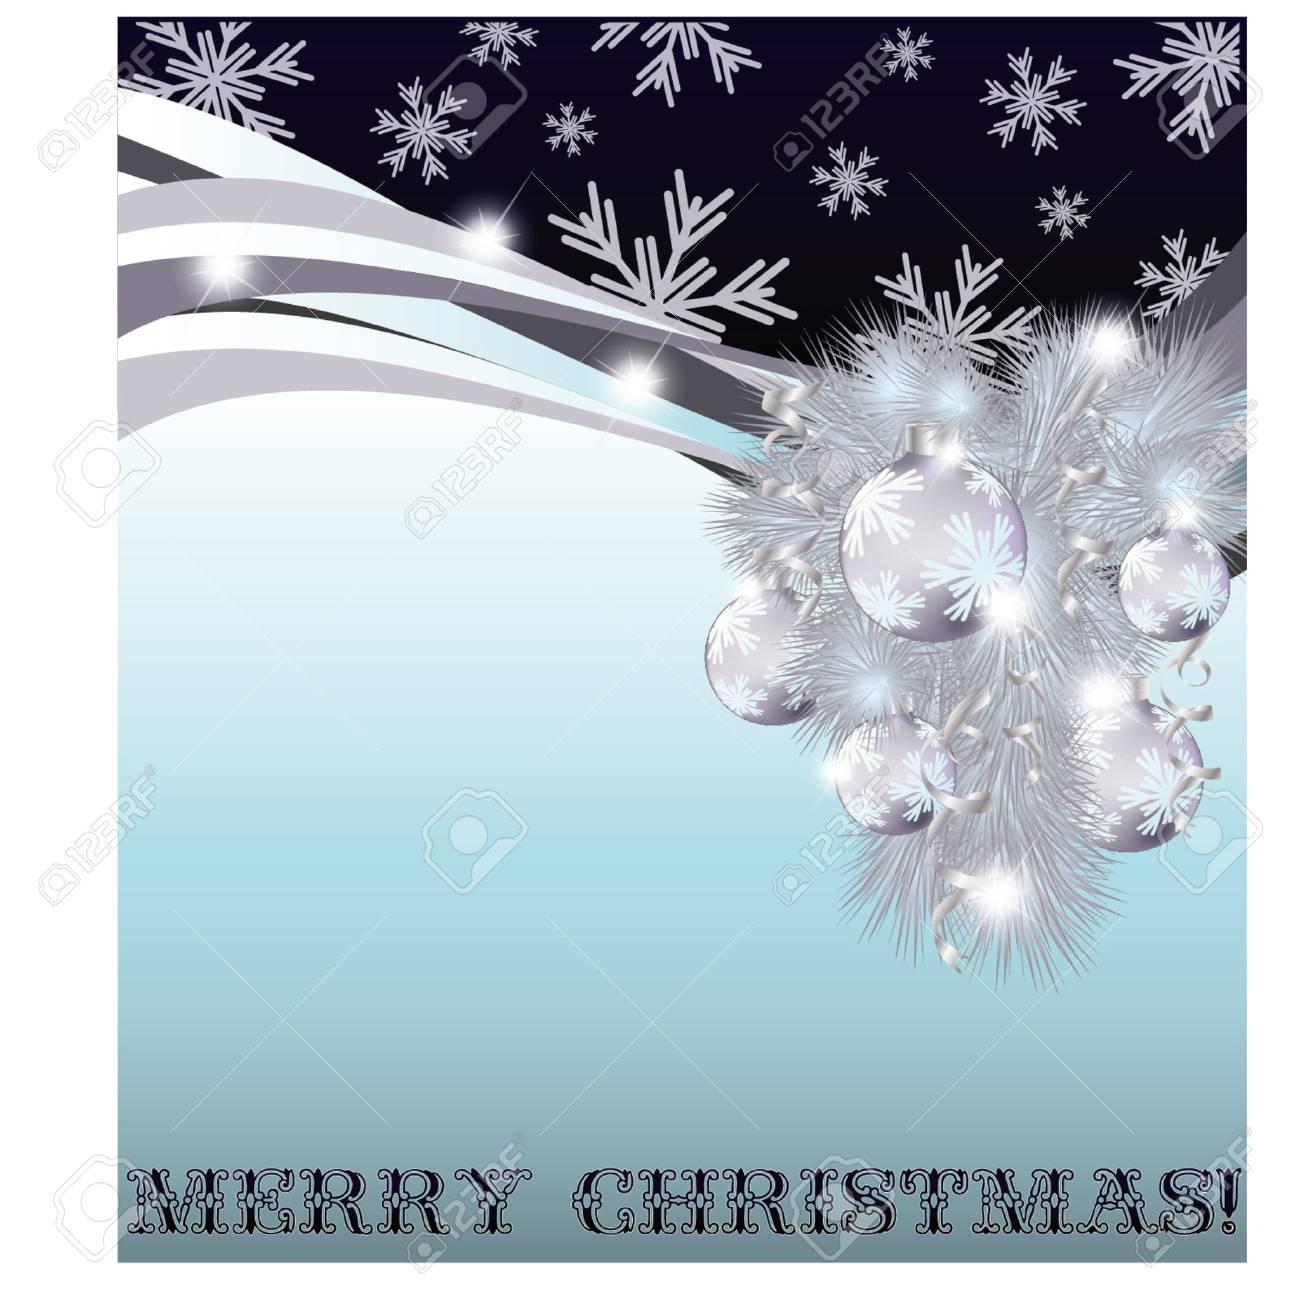 Merry Christmas Invitation Card Vector Illustration